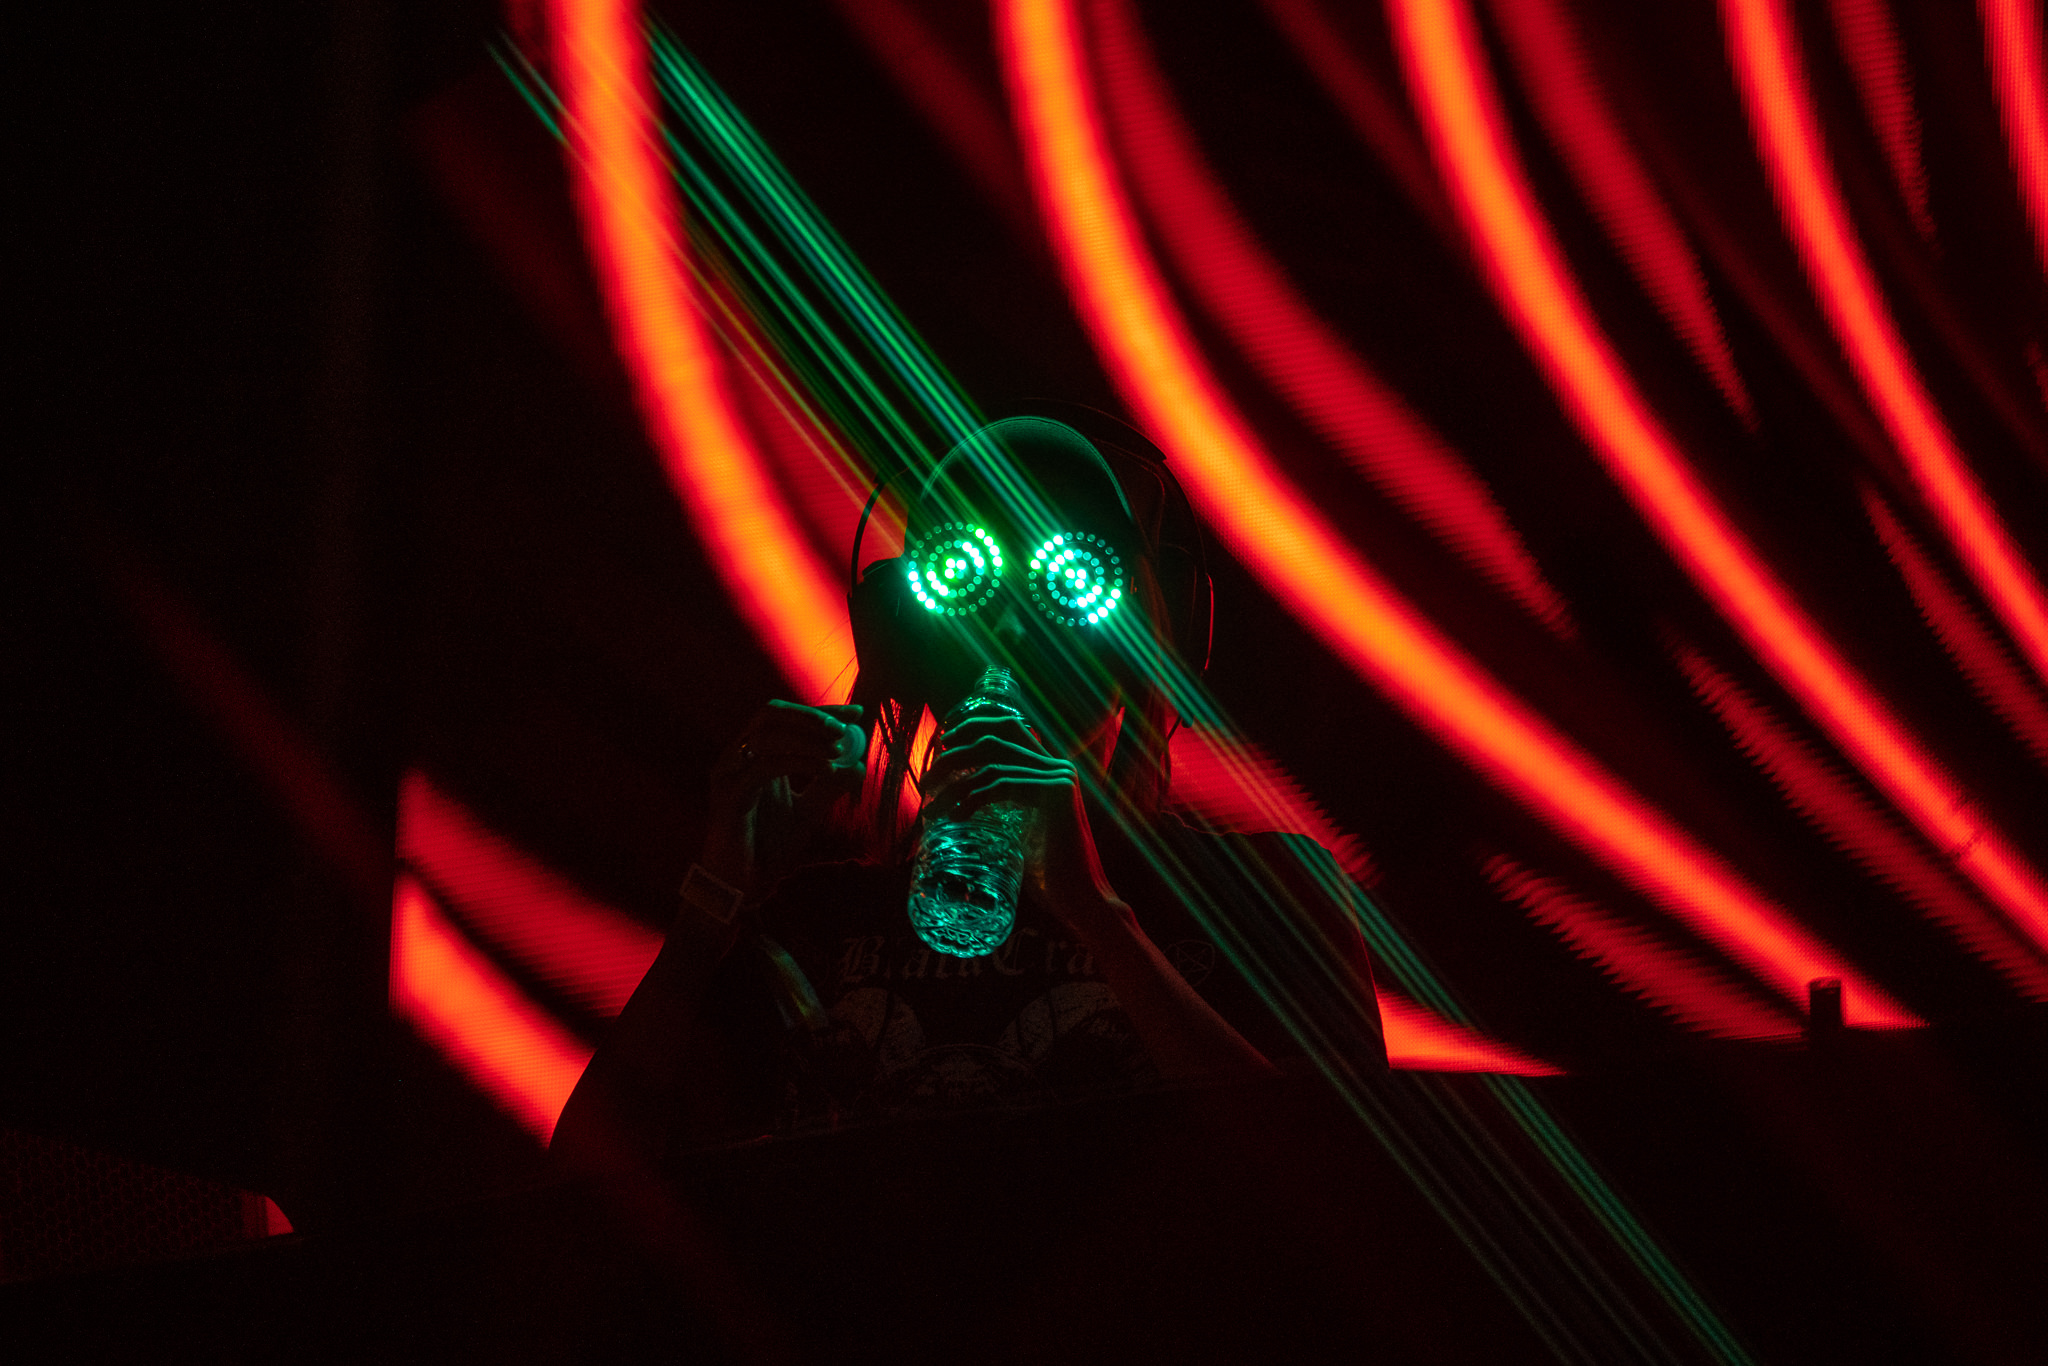 Rezz_NeonDesert2019_KirbyGladstein-08979.jpg